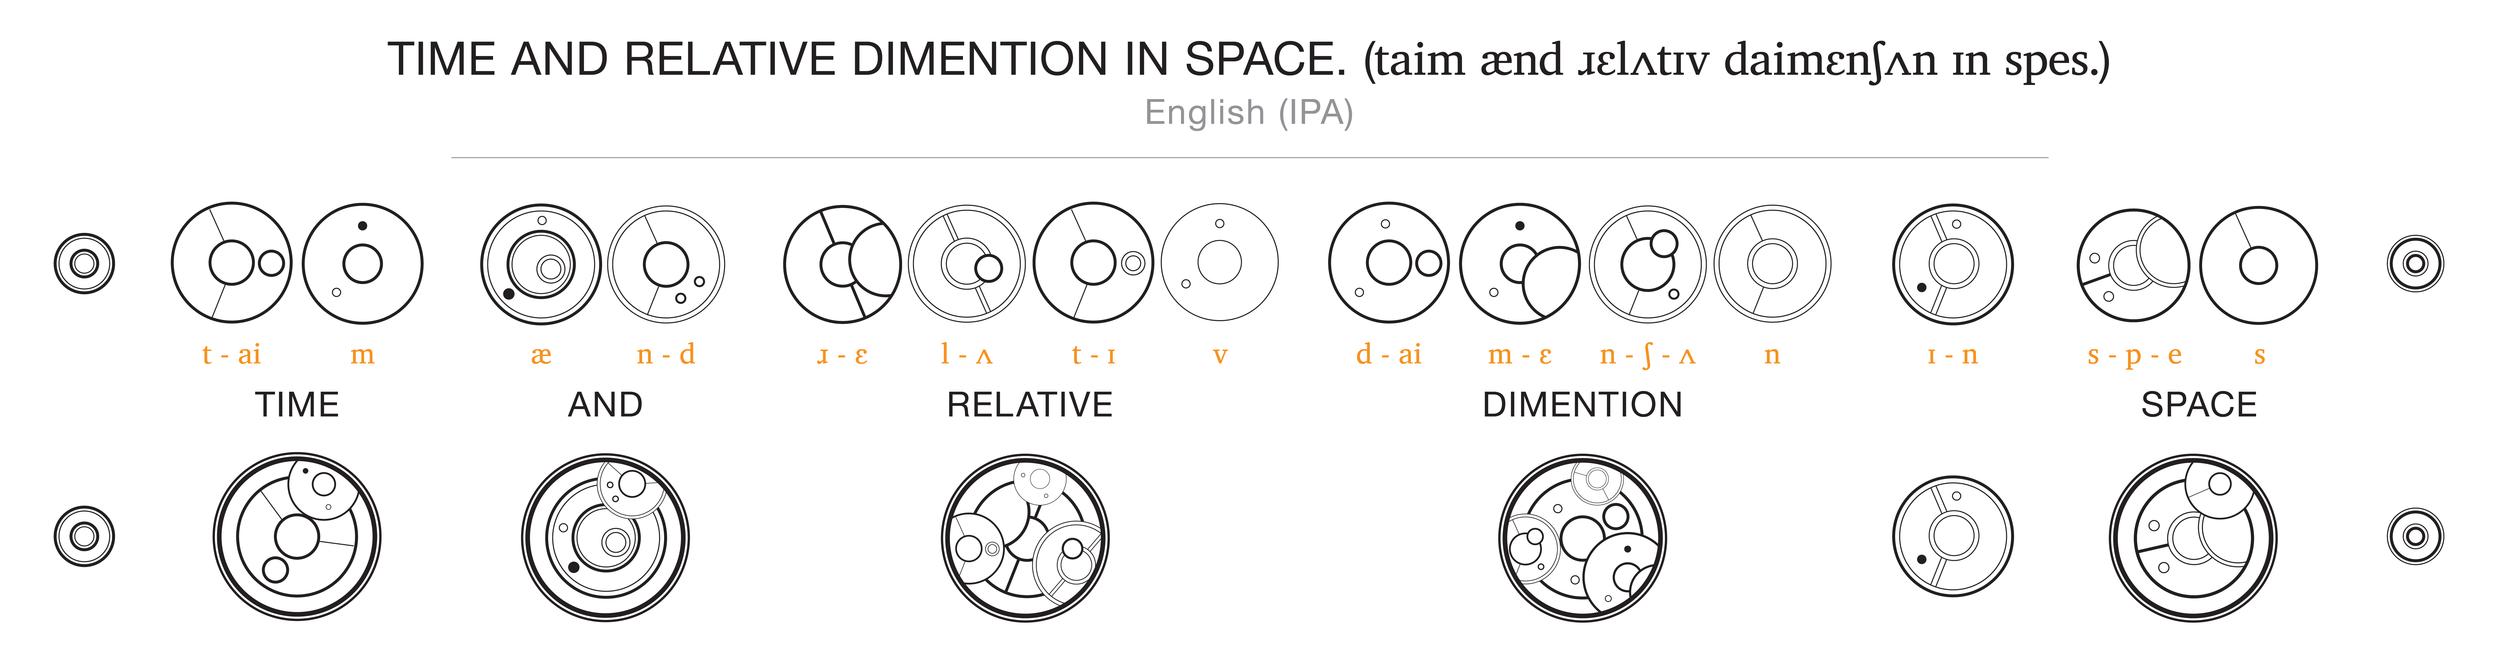 TimeAndRelativeDimensionInSpace-01.png